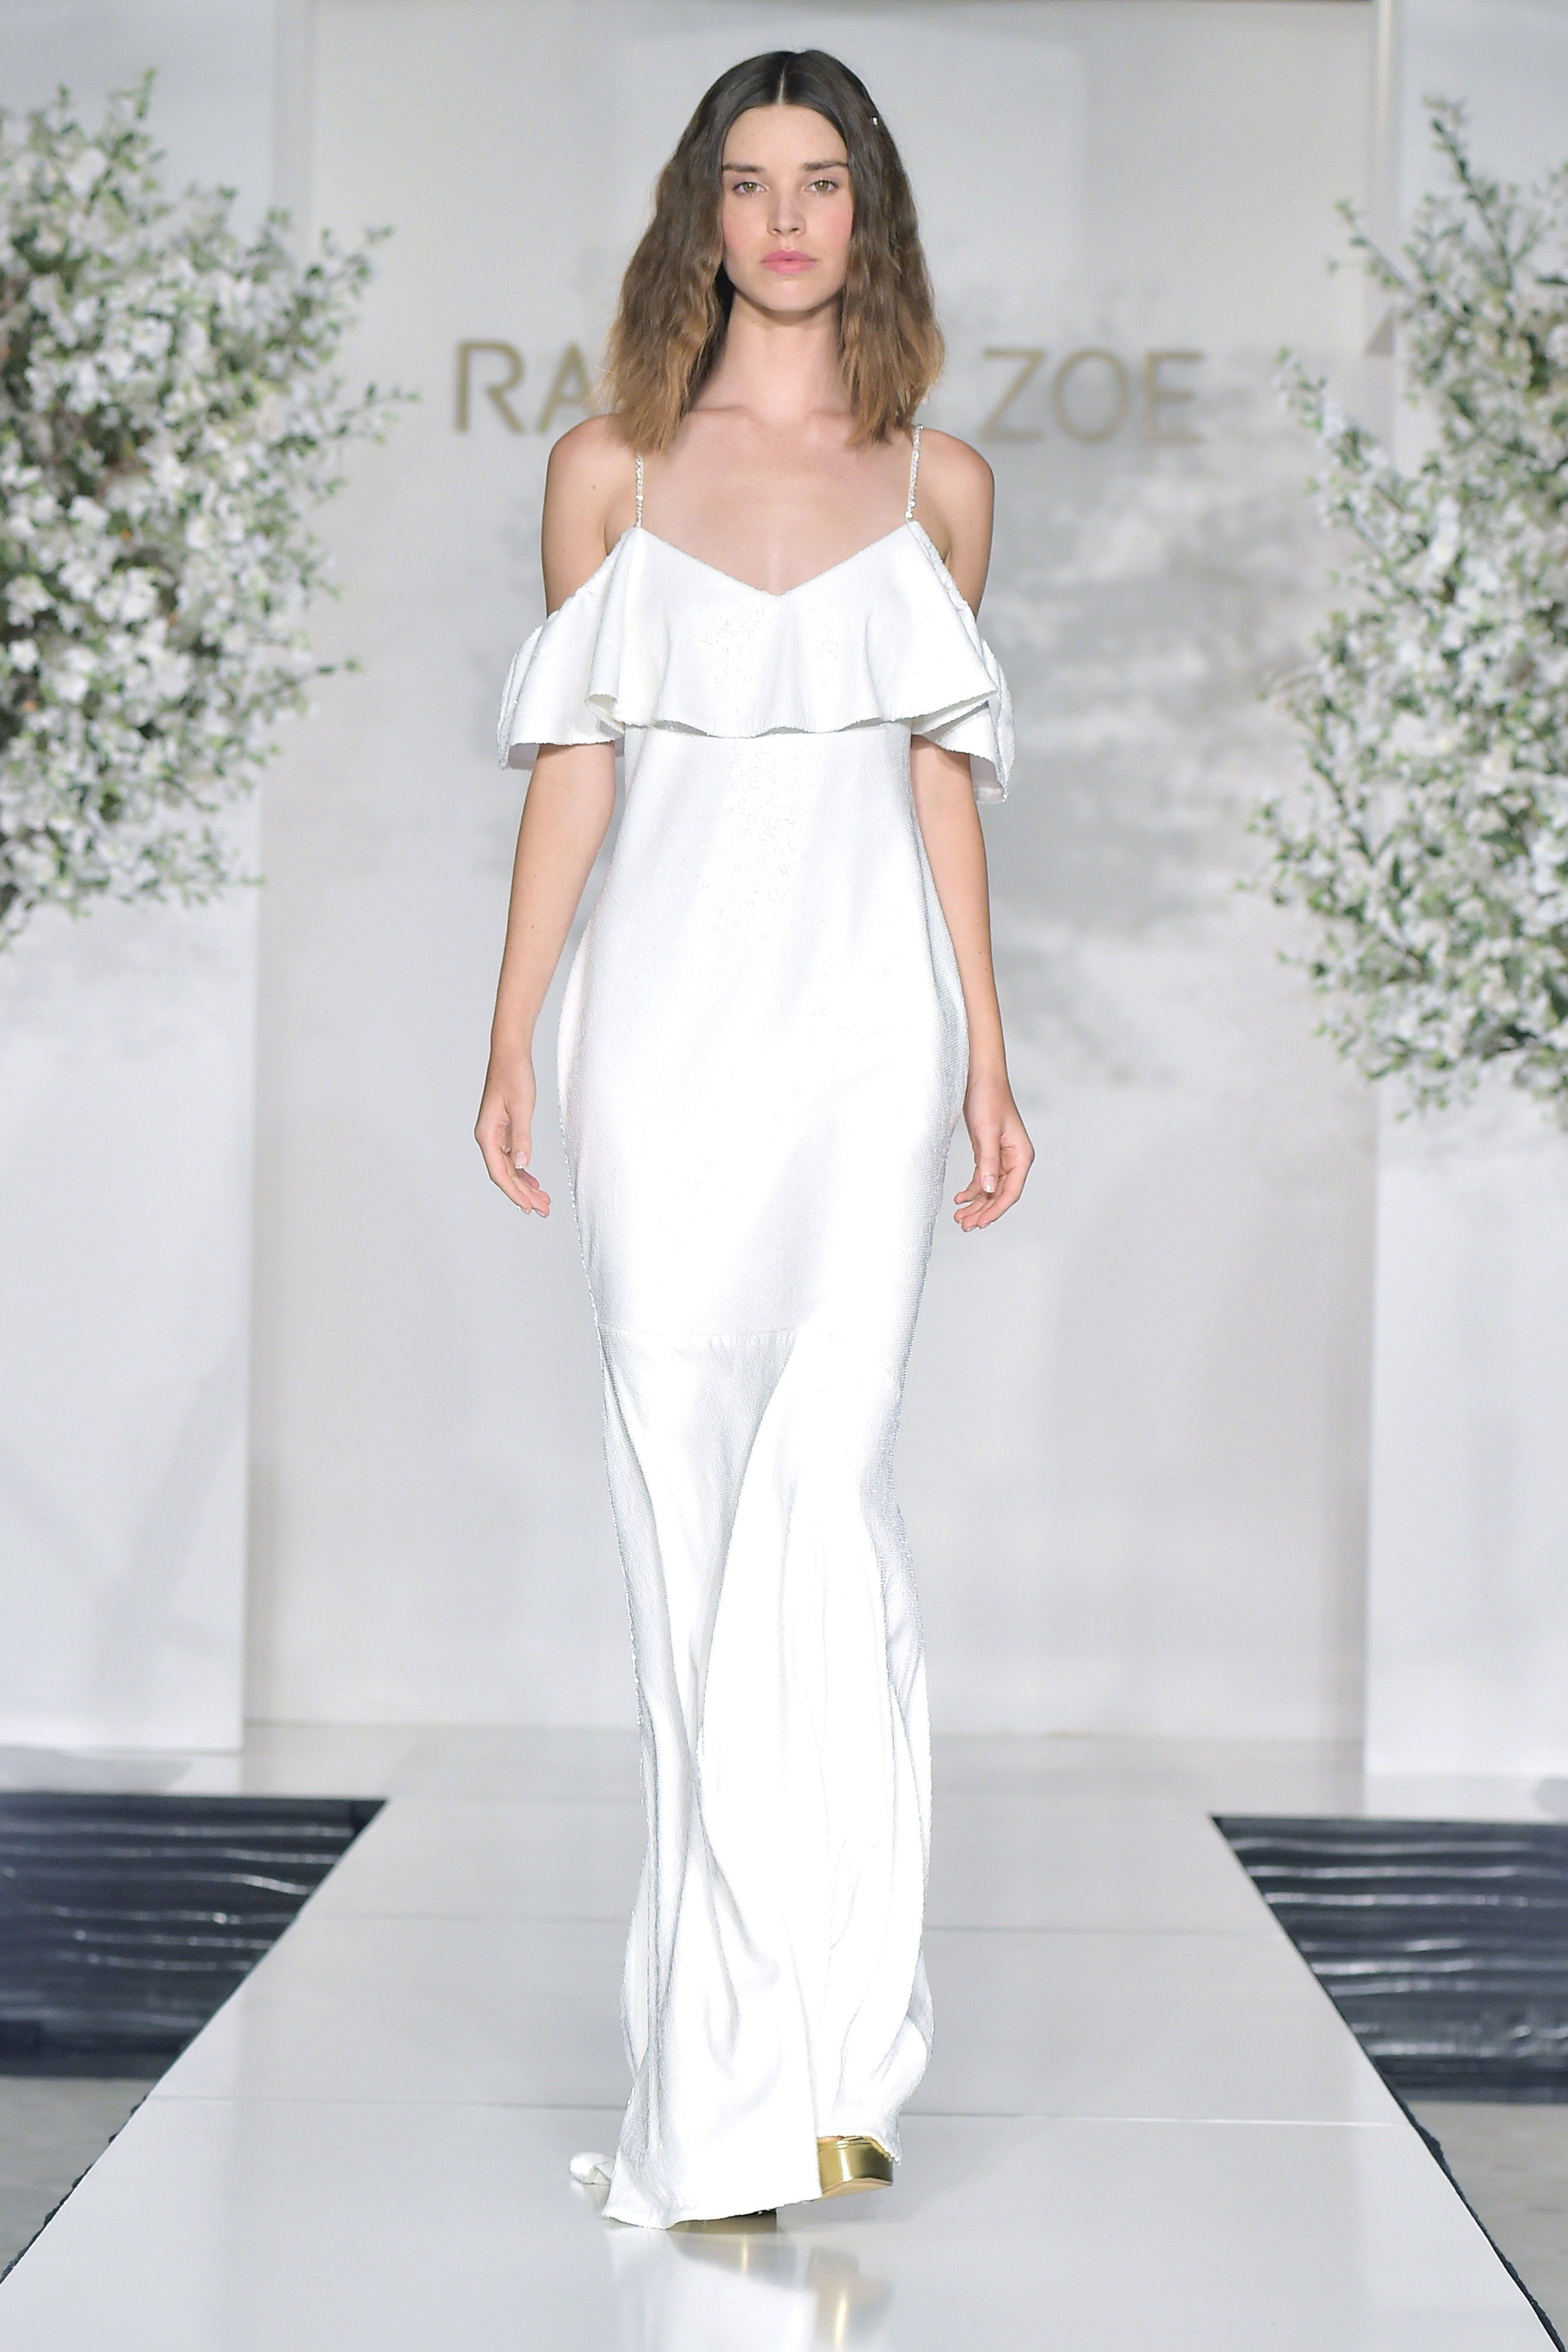 612f071232 Rachel Zoe Spring 2019 Ready-to-Wear Fashion Show in 2018